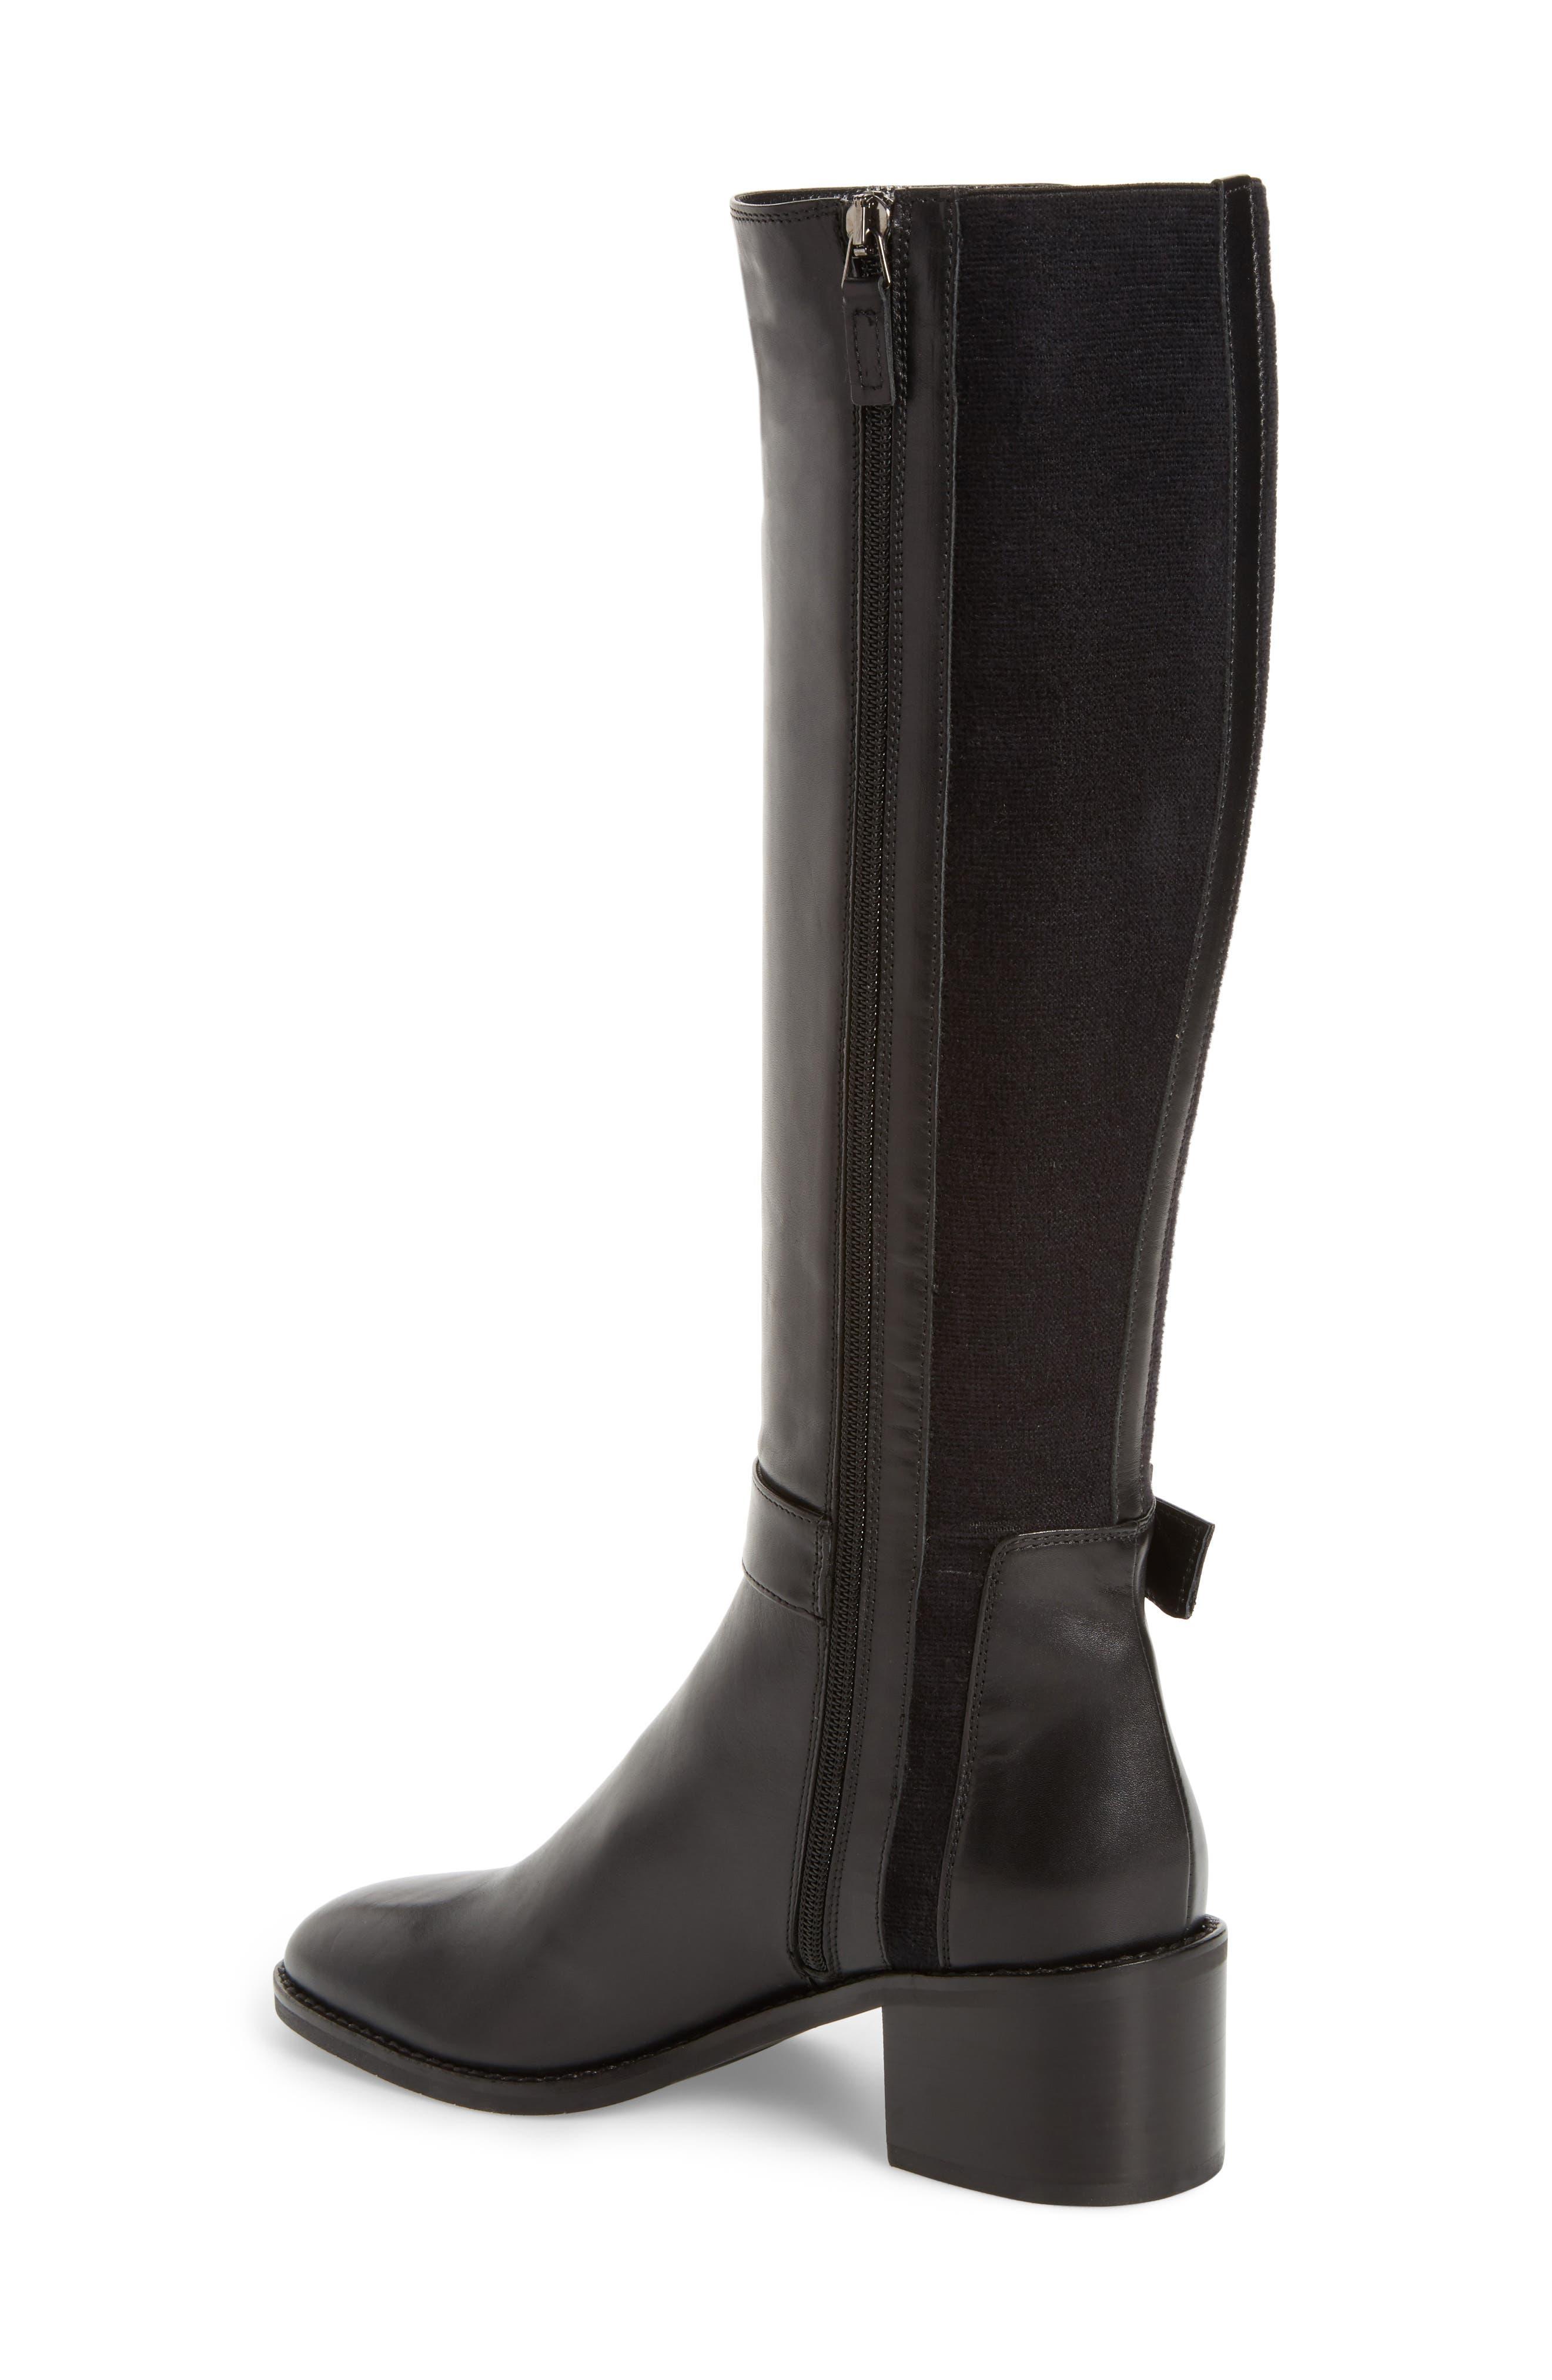 Joanna Weatherproof Tall Boot,                             Alternate thumbnail 2, color,                             Black